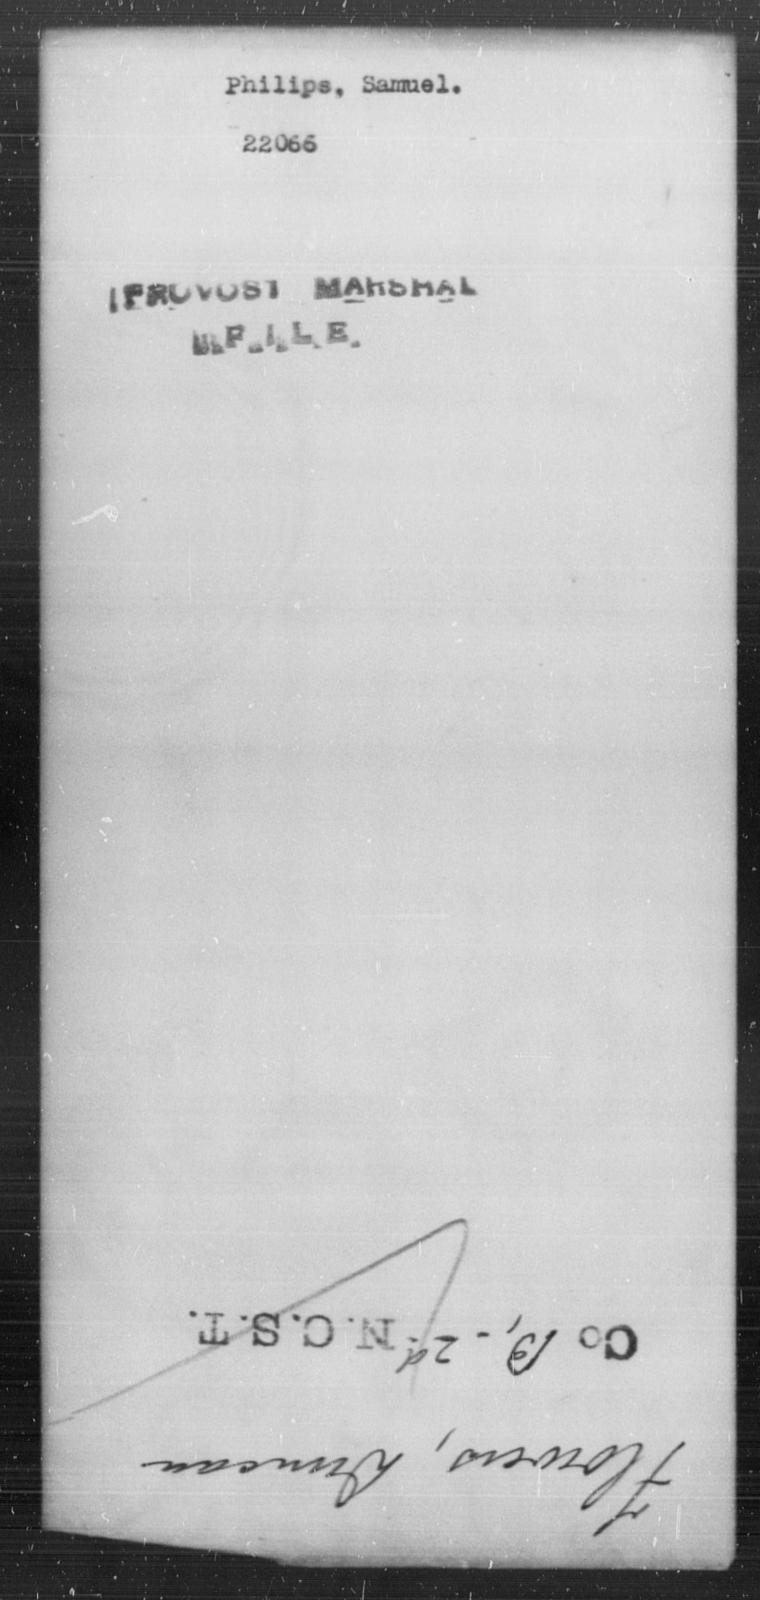 Philips, Samuel - State: [Blank] - Year: [Blank]